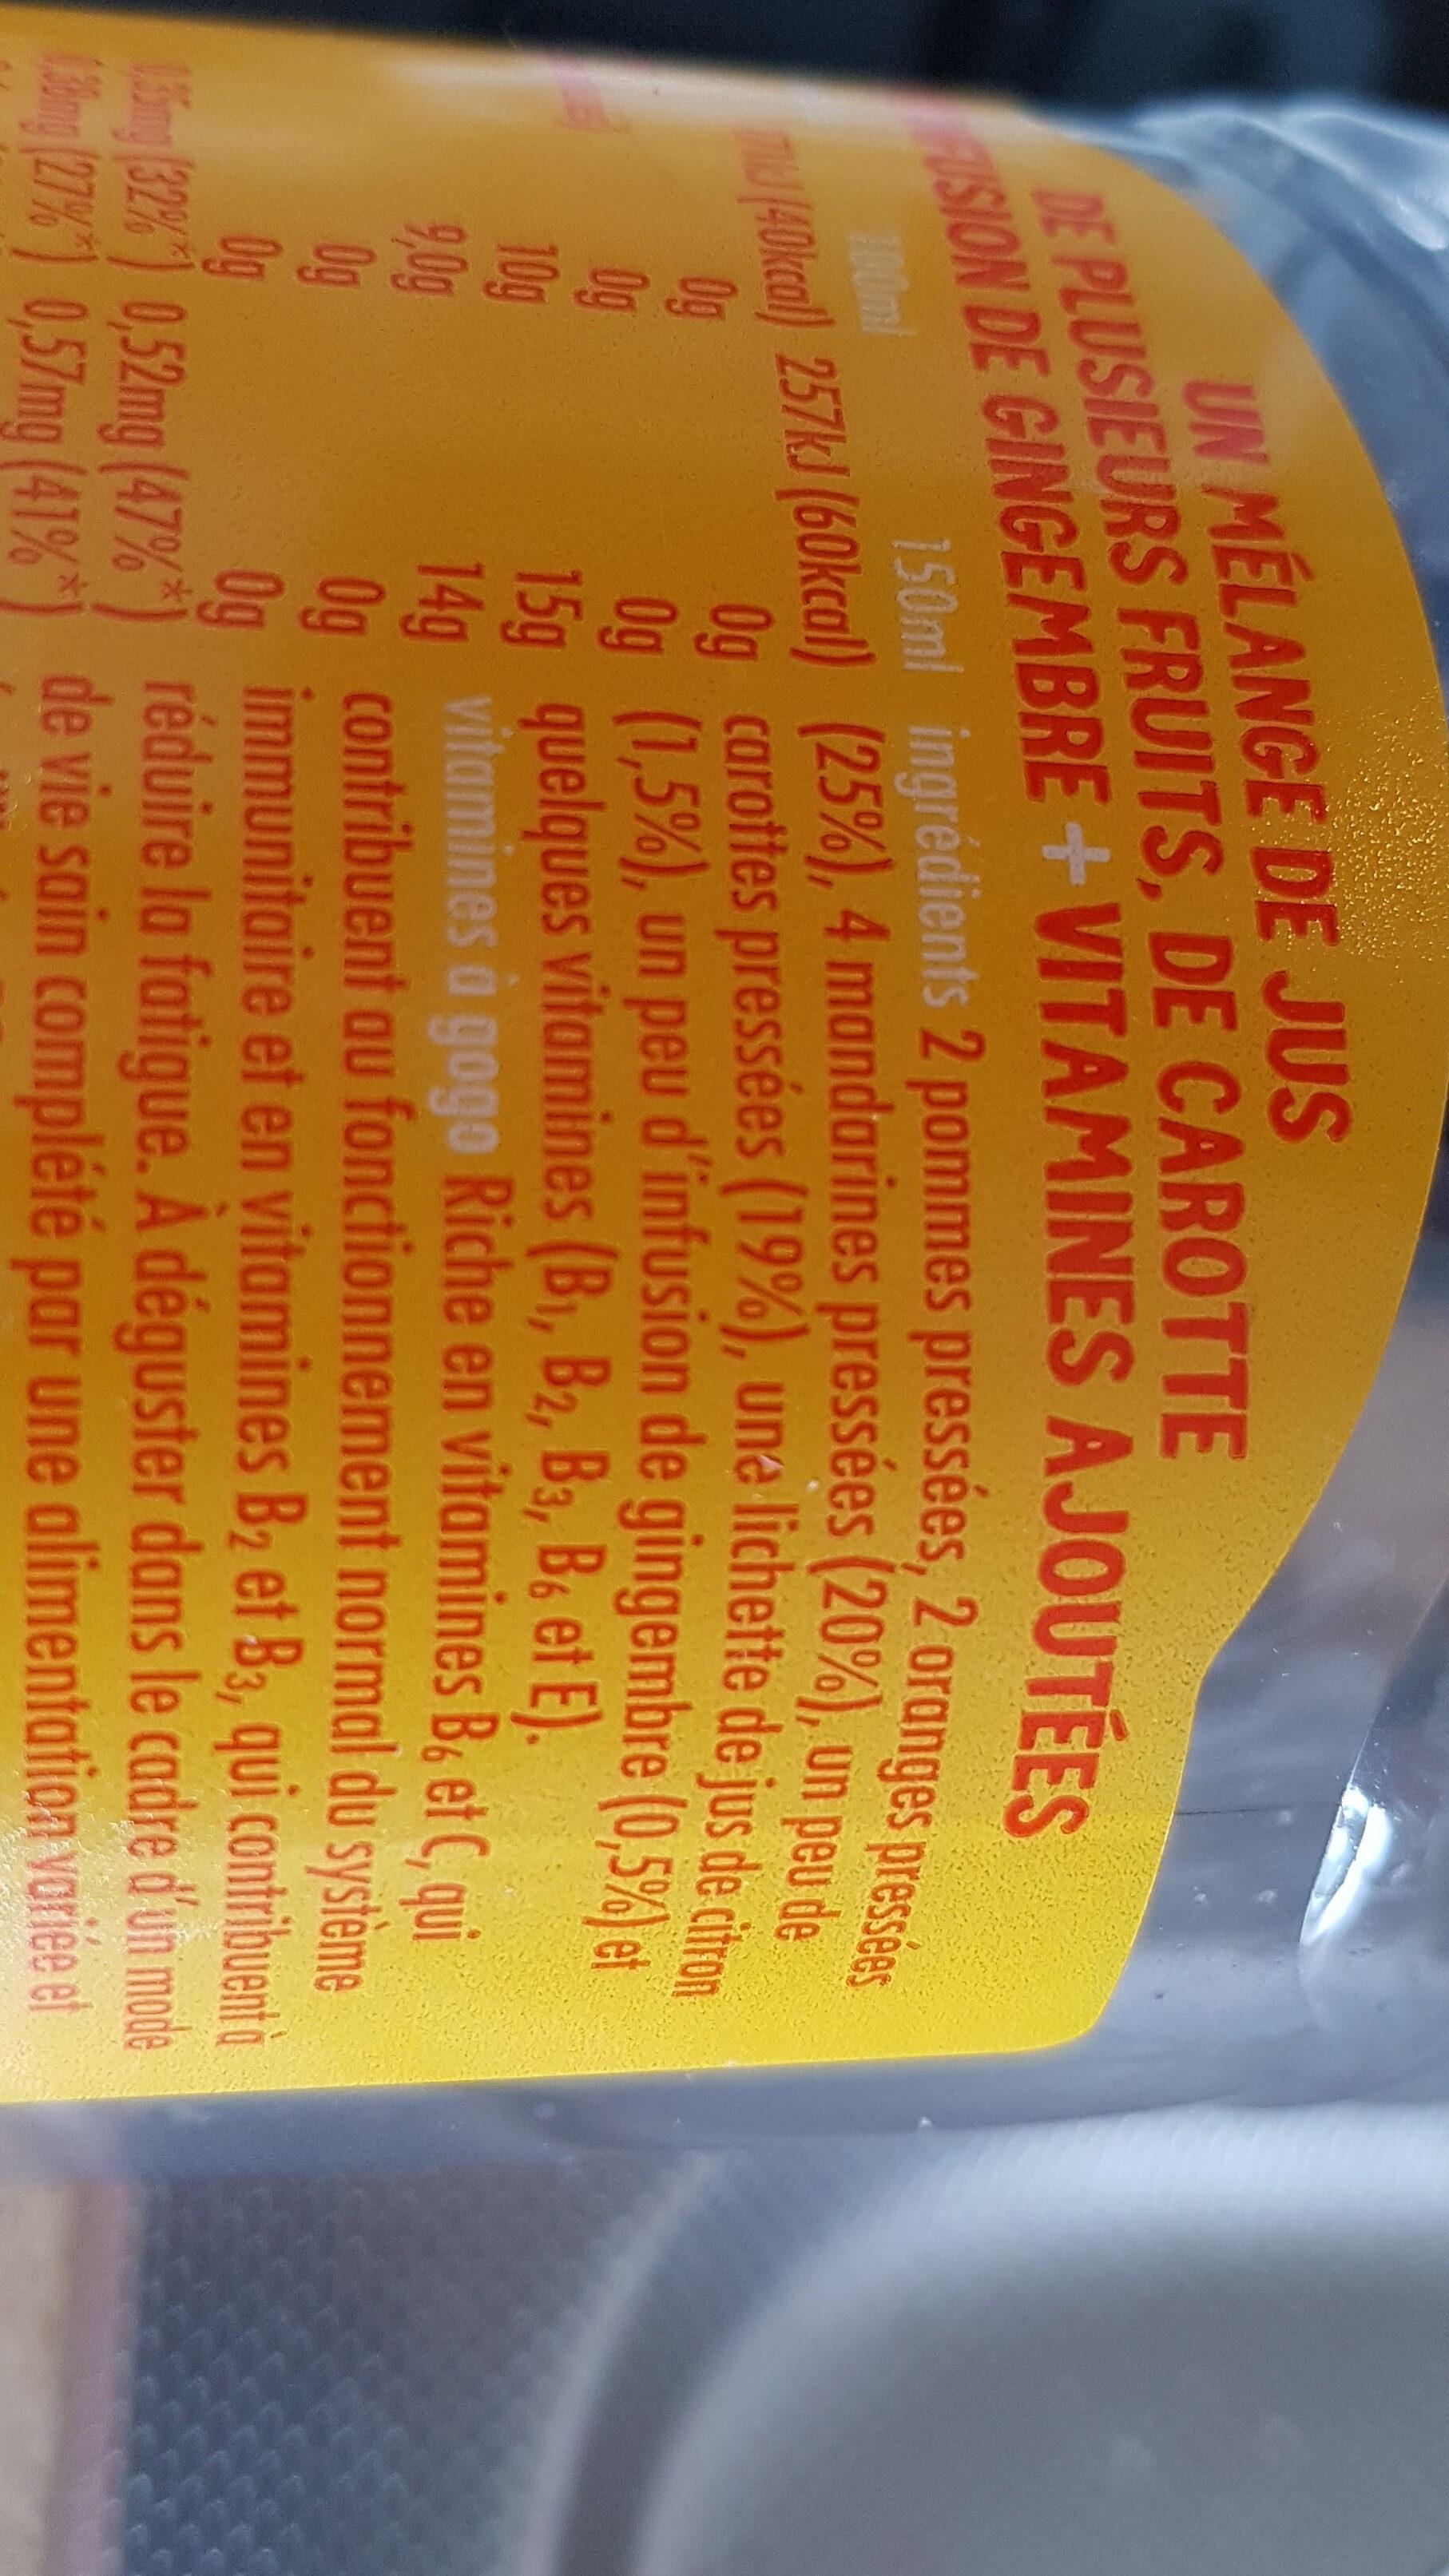 Innocent Zest Défense - Ingredients